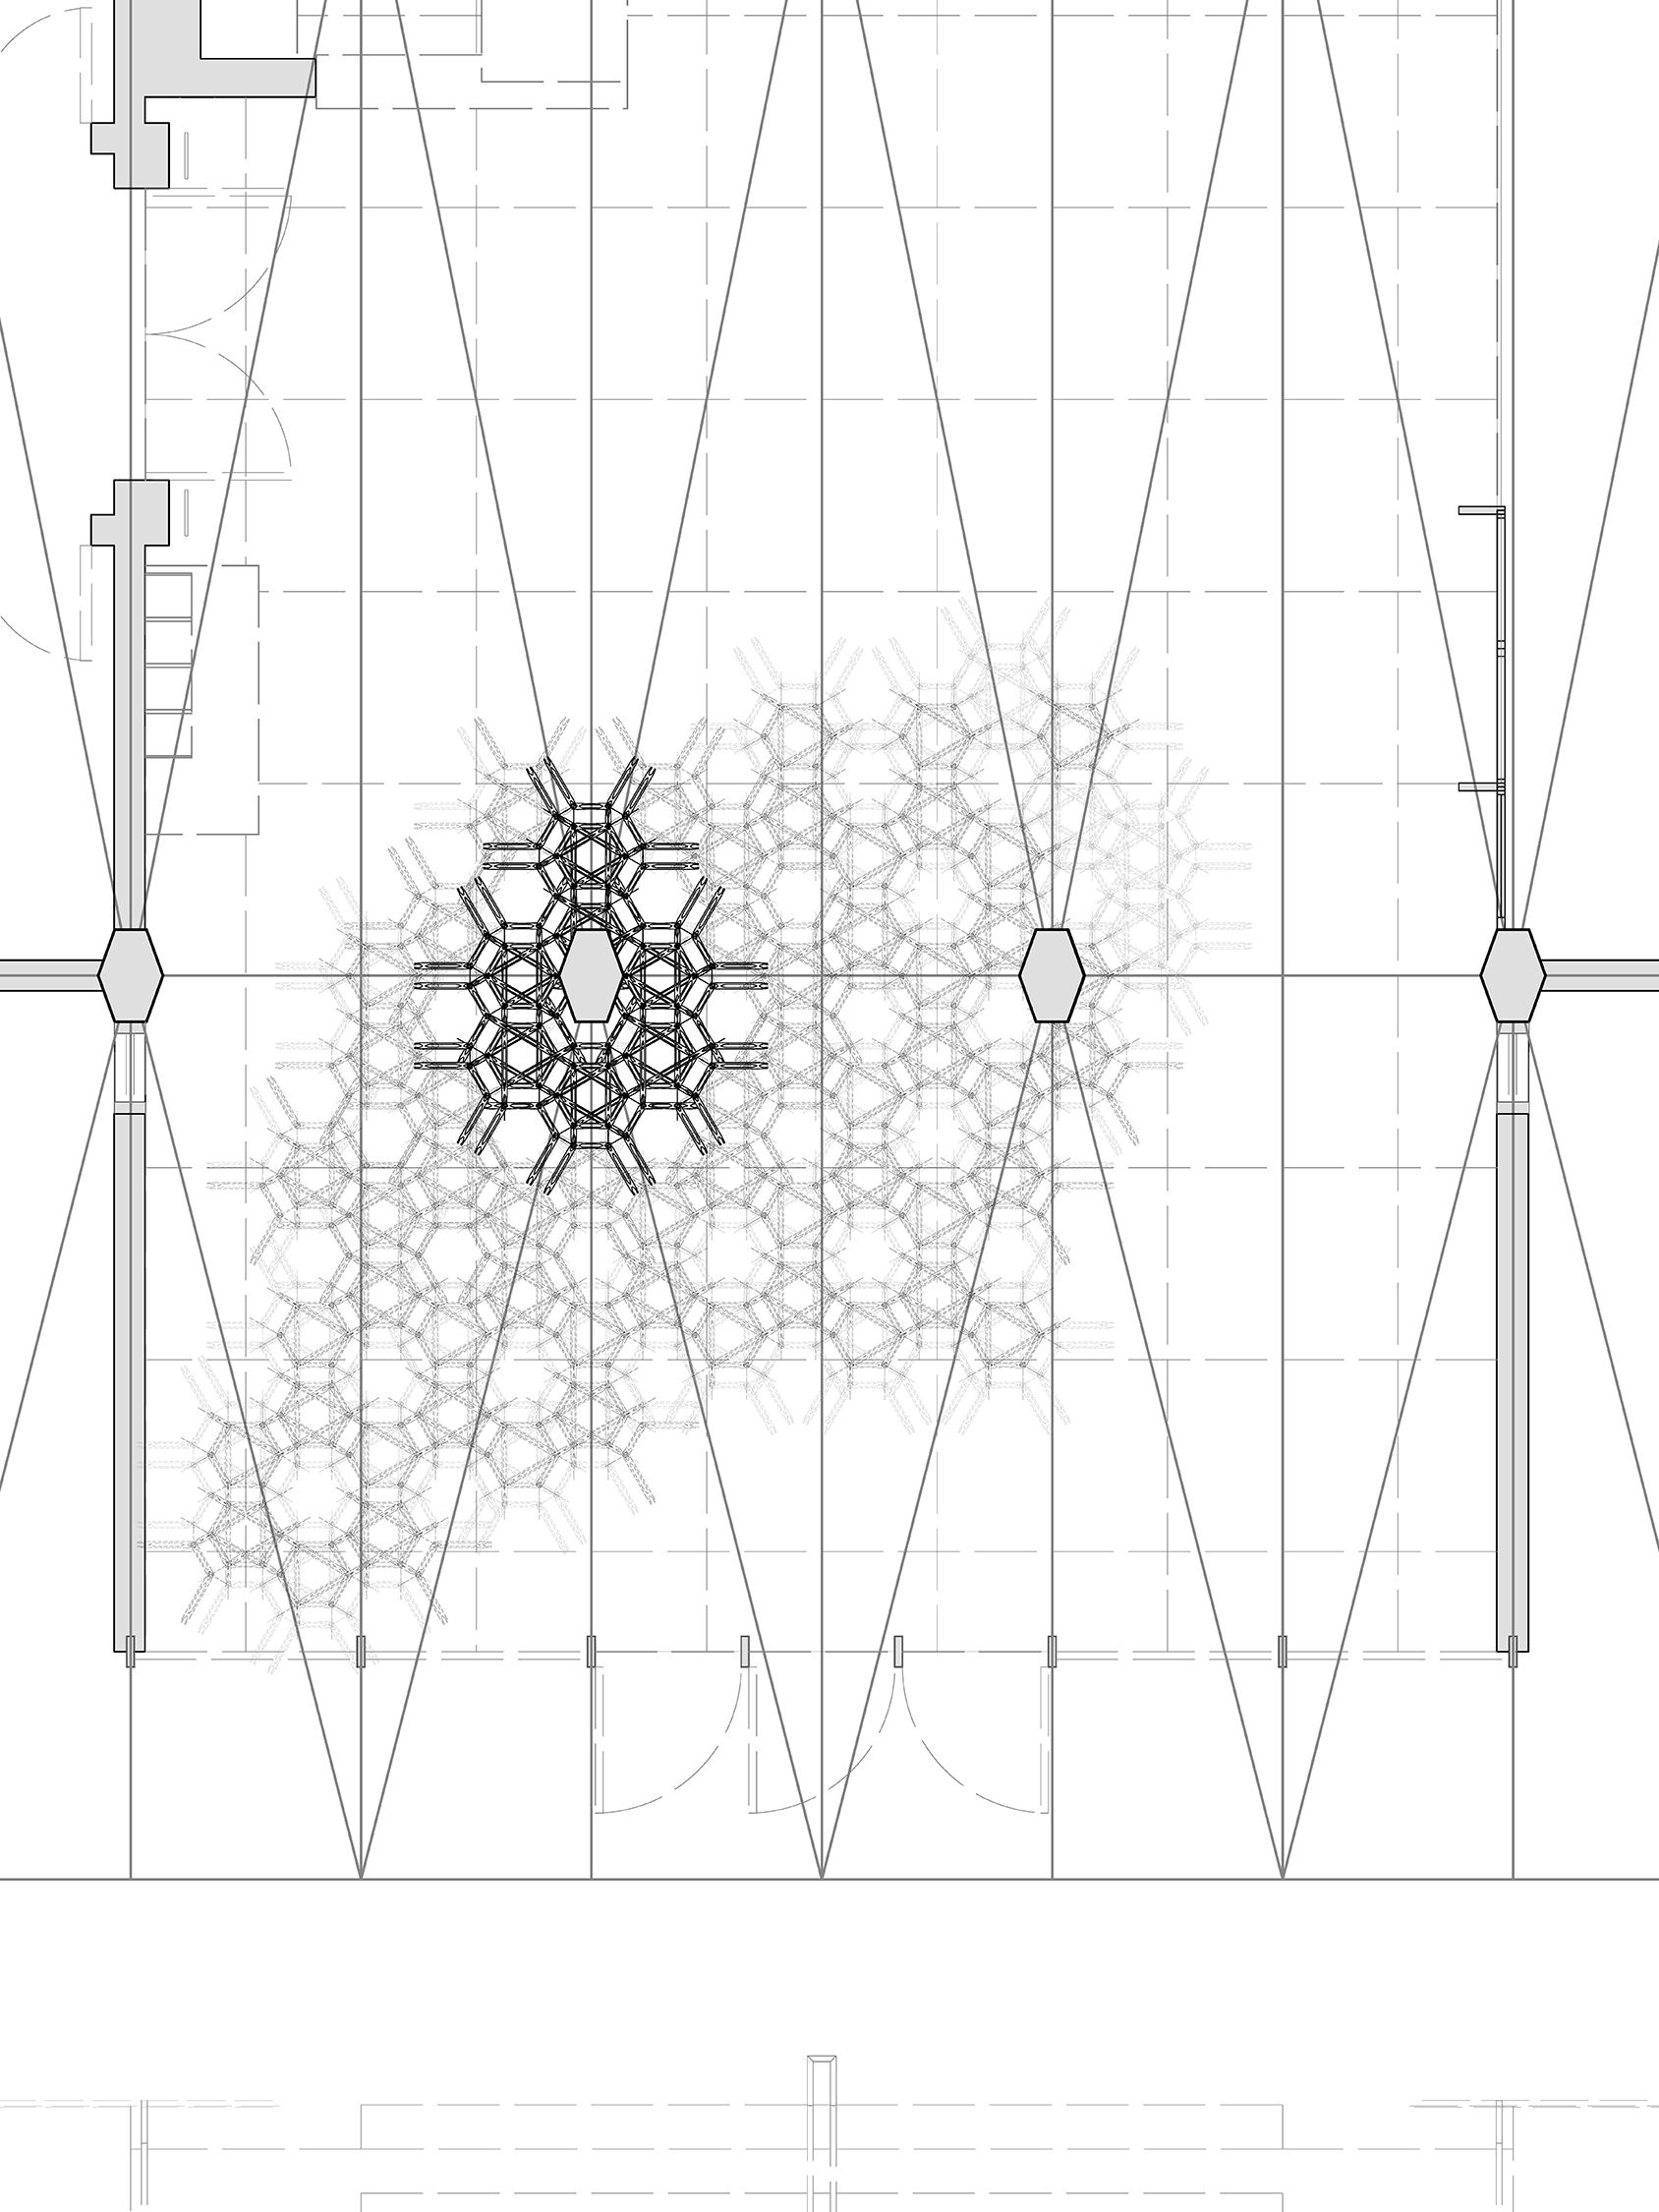 SP16_Structural Substances_FinalReview_ReflectedCeilingPlan_Lowres.jpg